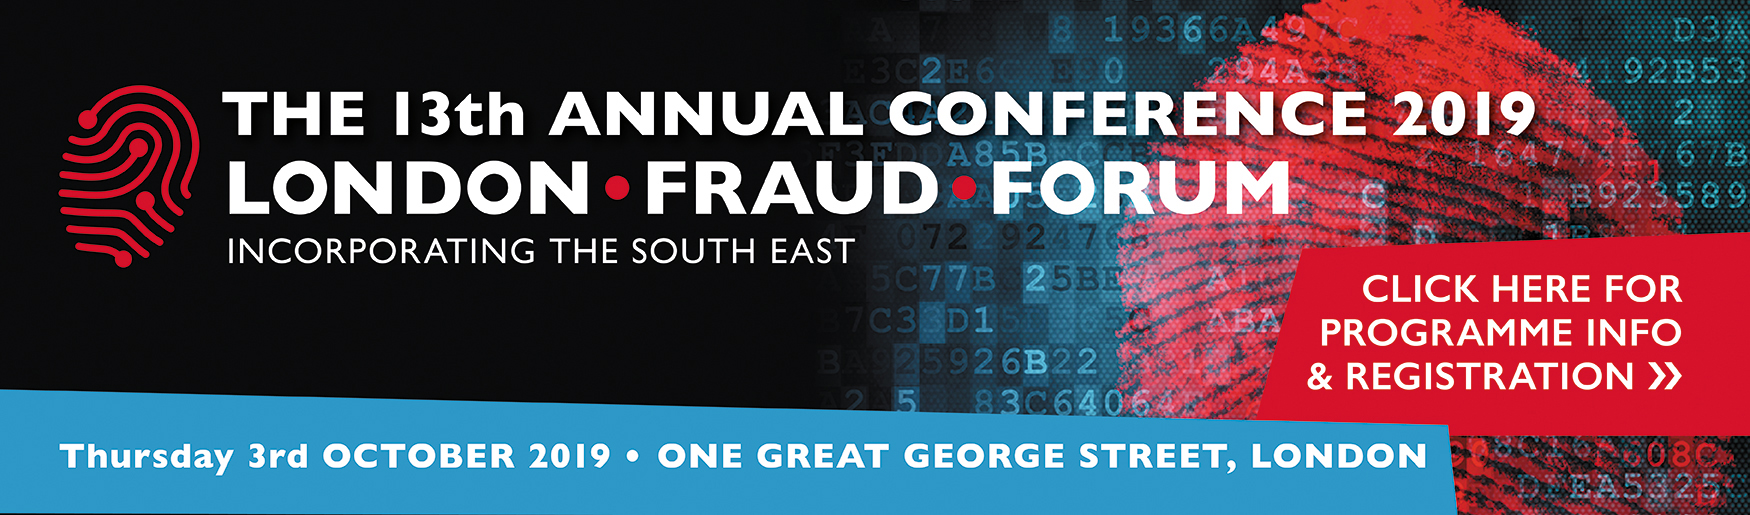 LFF 13th Annual Conference